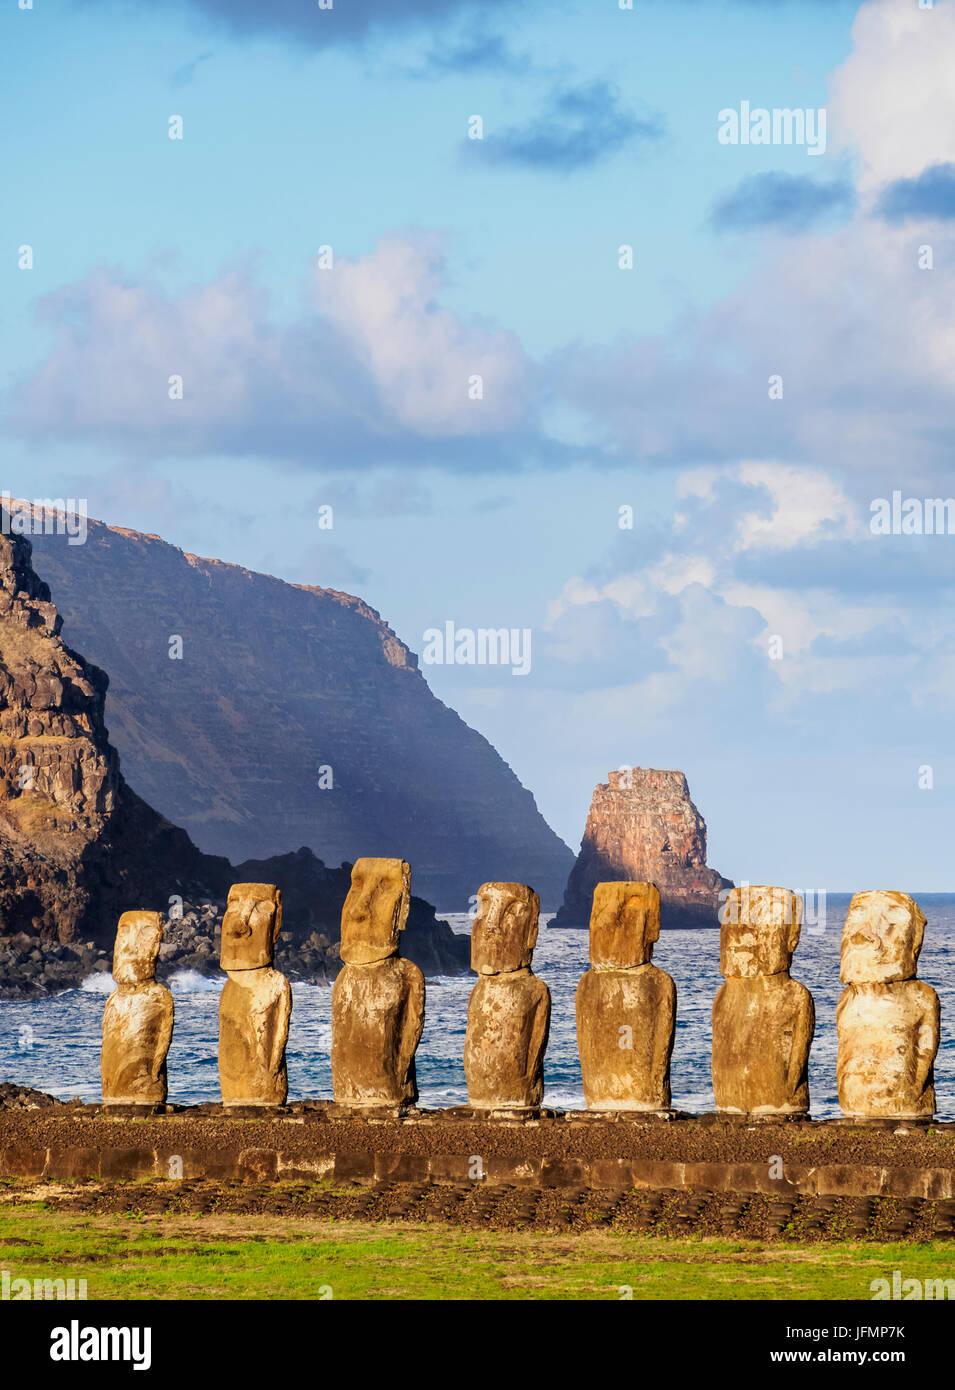 Moais in Ahu Tongariki, Rapa Nui National Park, Easter Island, Chile - Stock Image